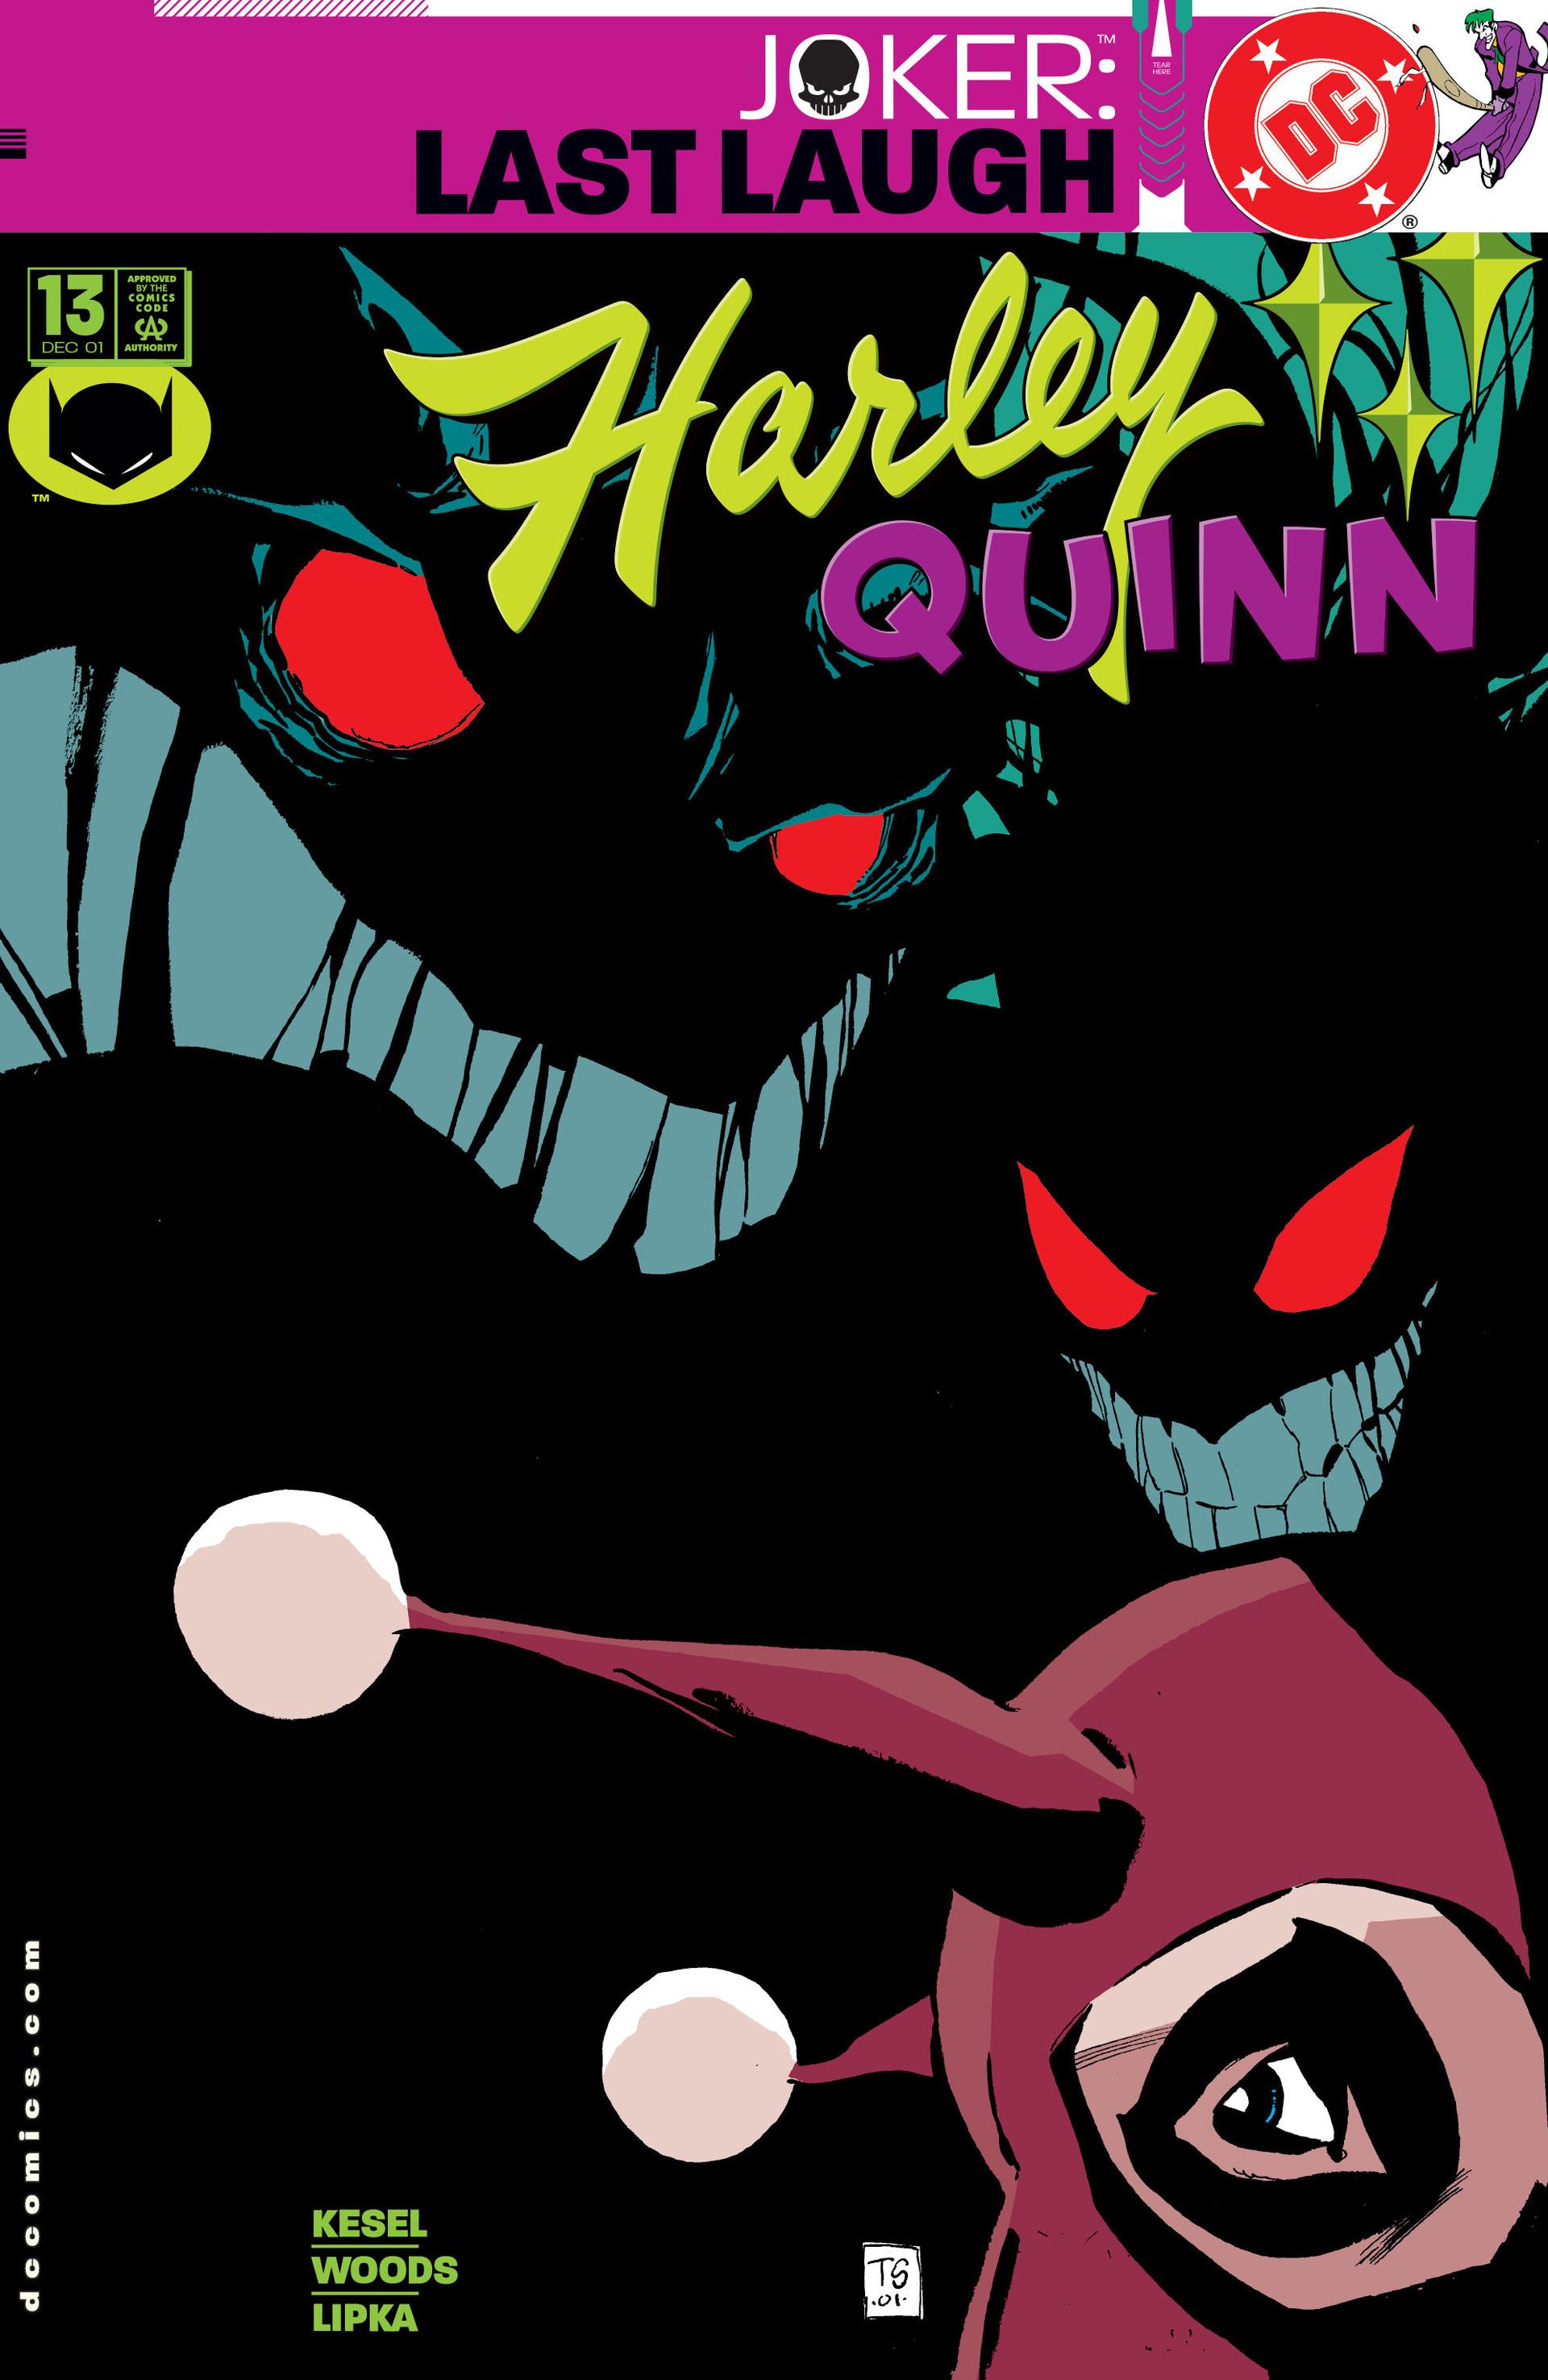 Harley Quinn Vol.1 #13